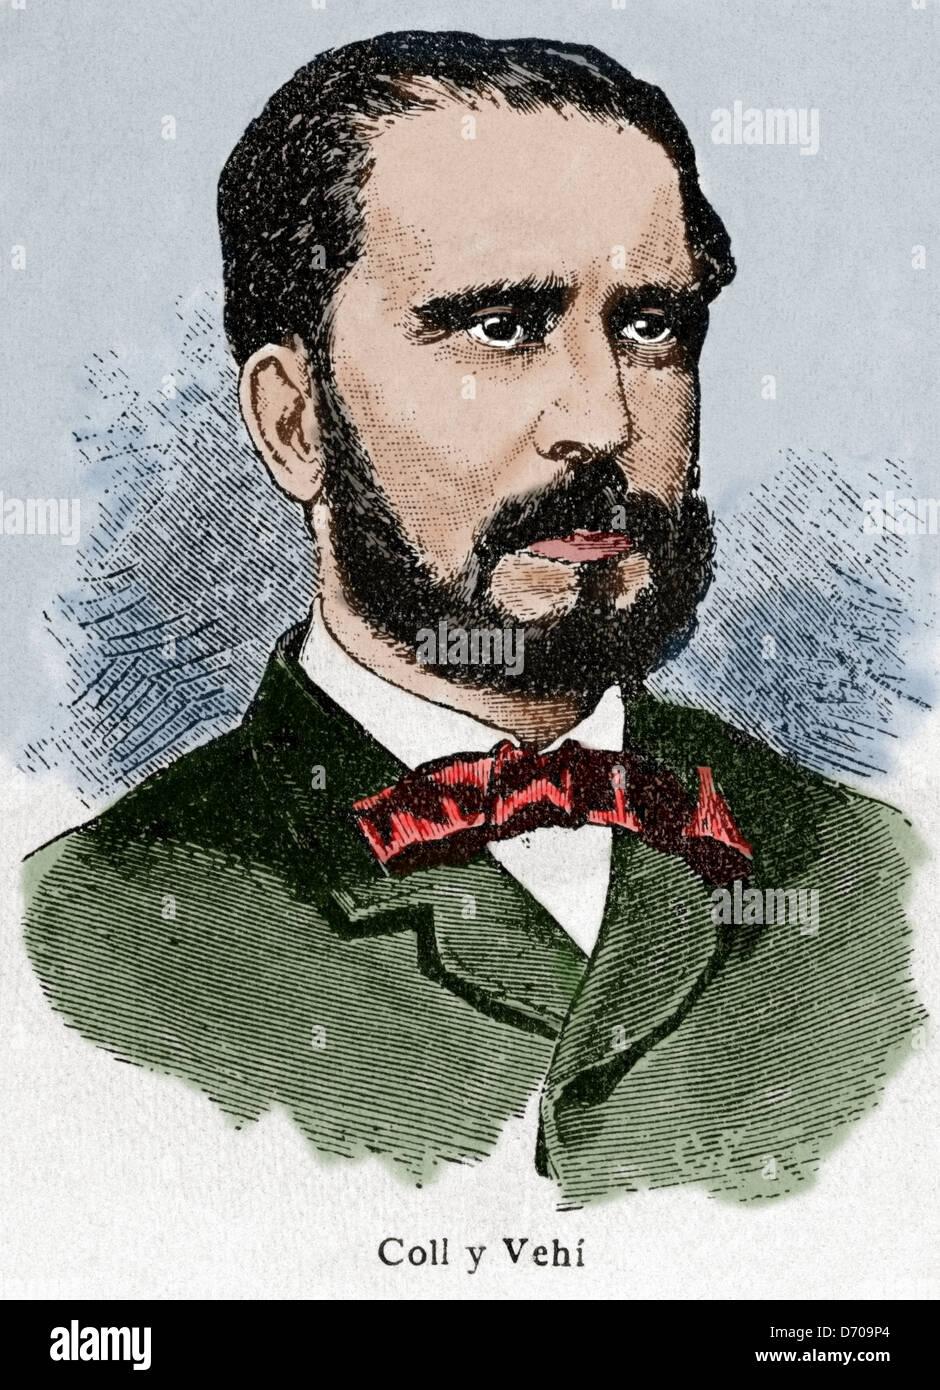 Jose Coll Vehi (1823 -1876). Spanish literary theorist. Engraving in History of Spain, edited by Blas Cami, 1910. - Stock Image